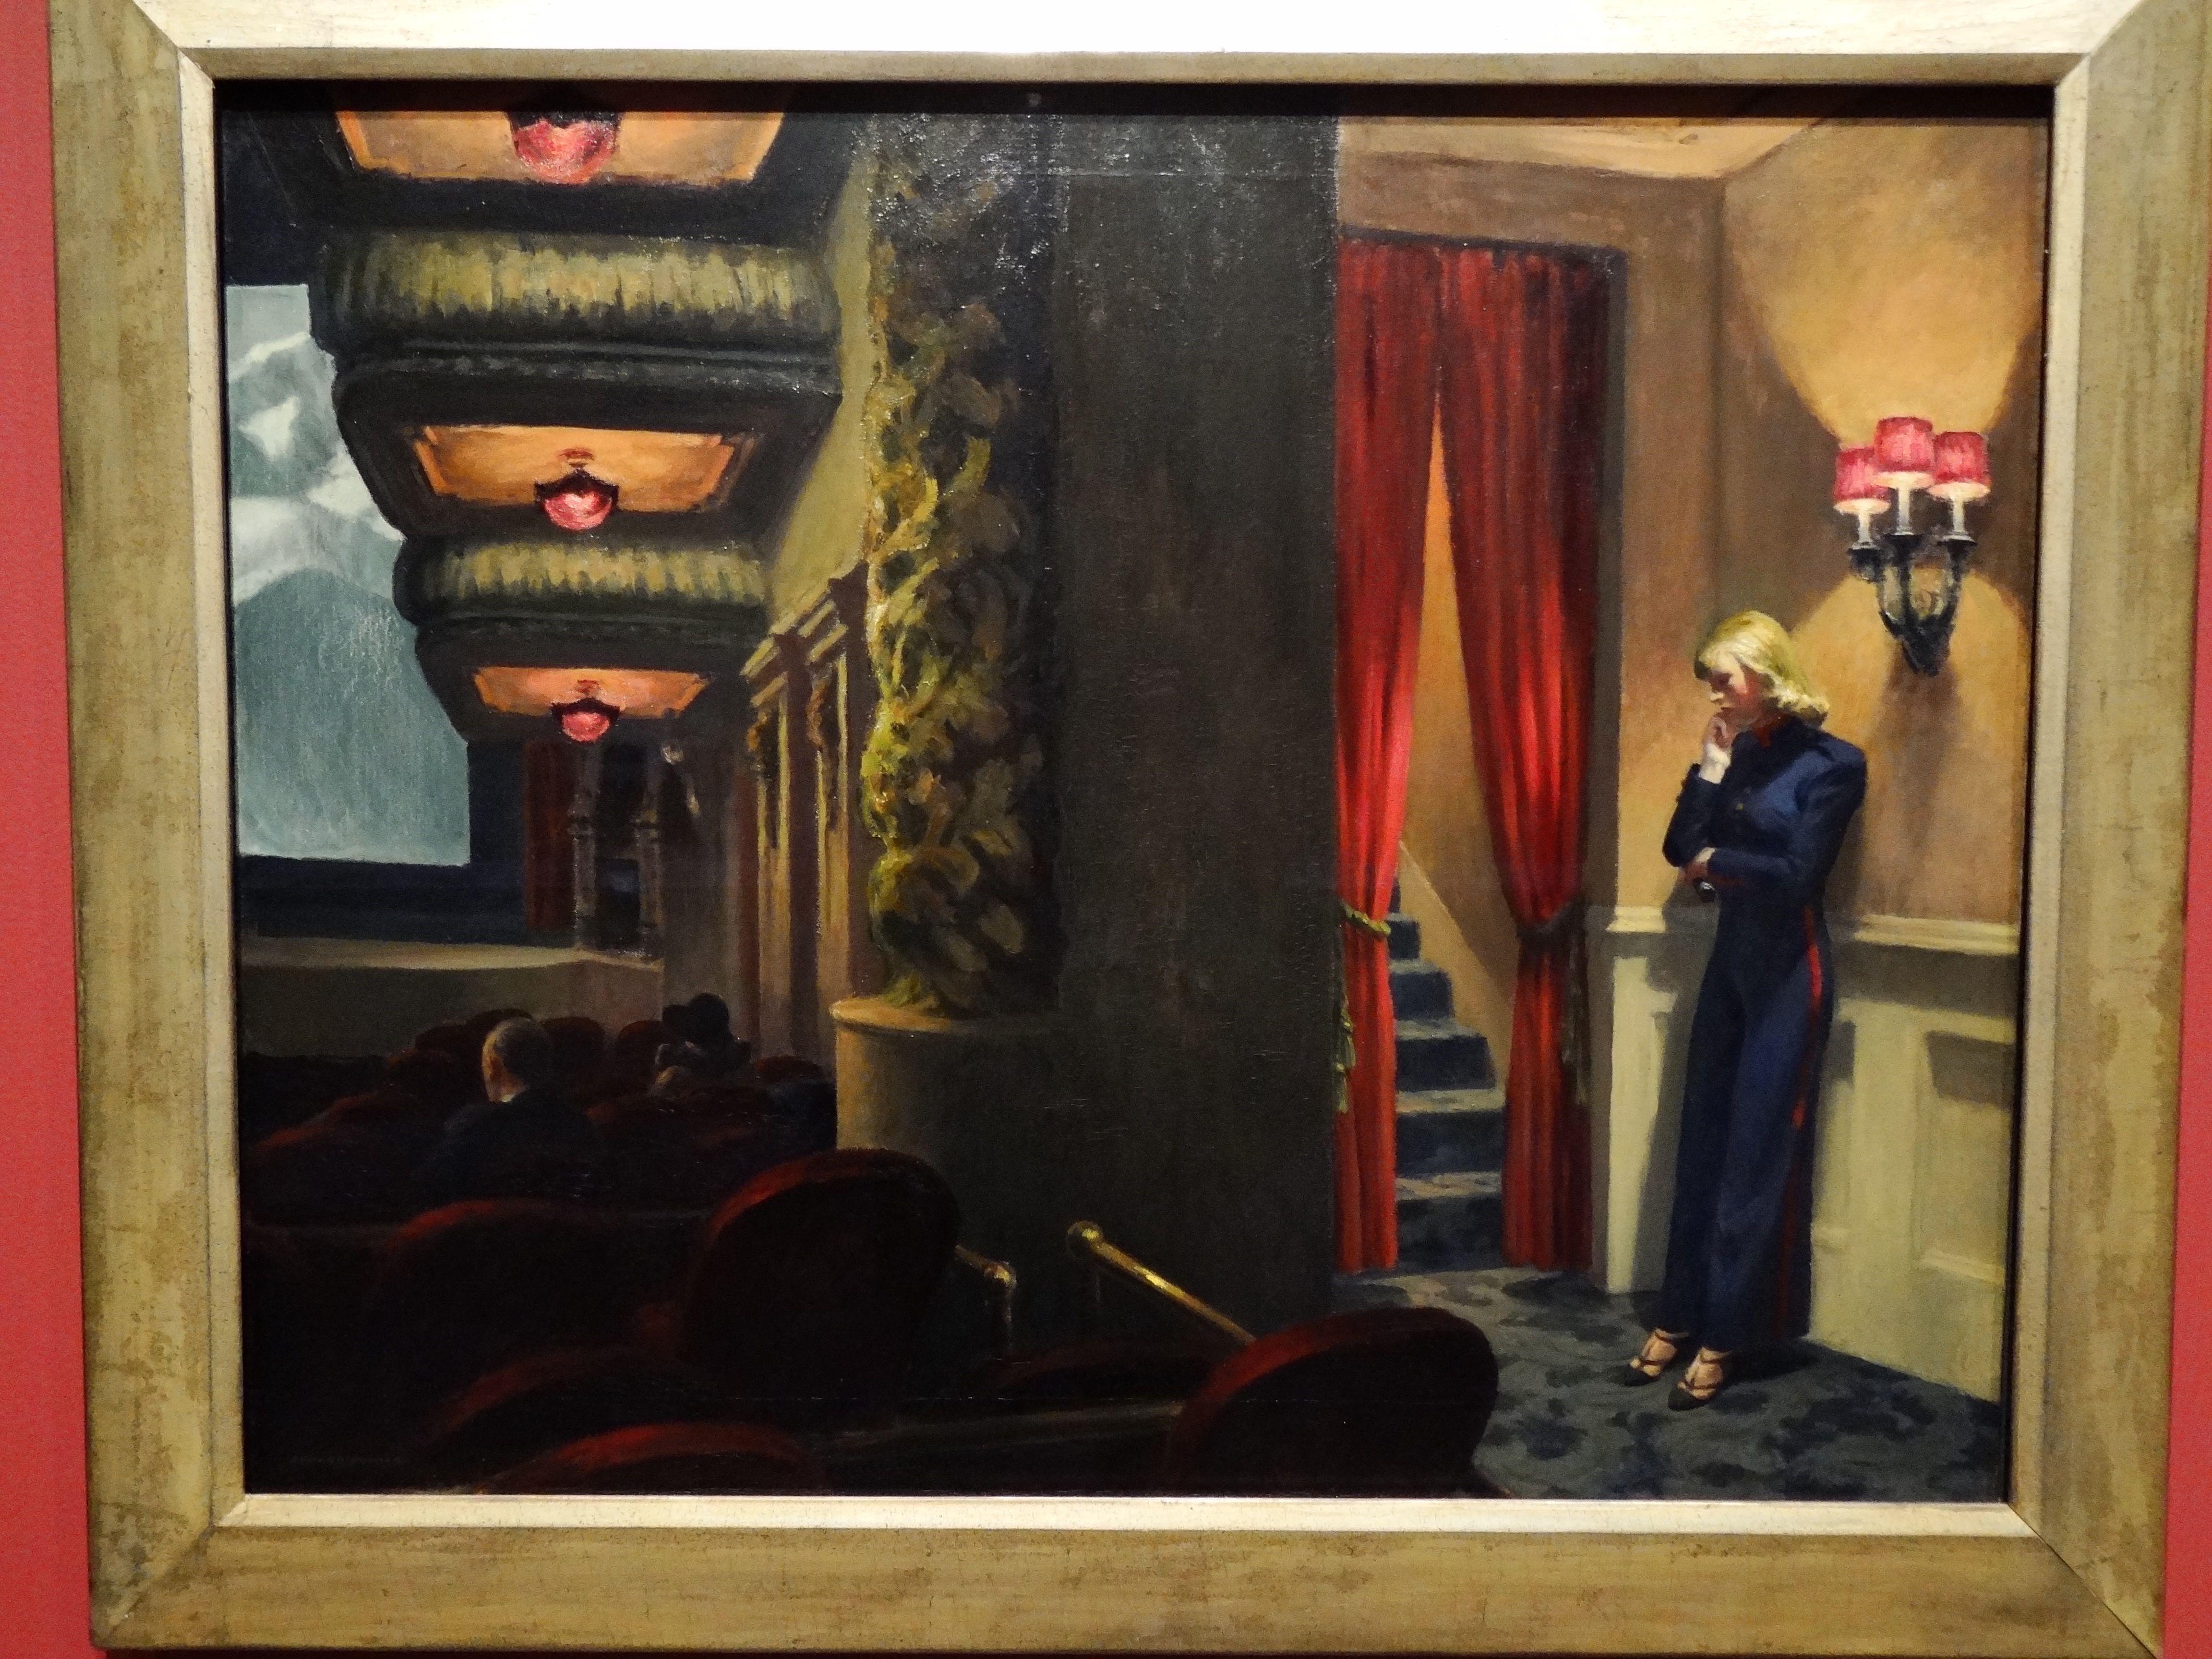 Edward Hopper, New York Movie 1939 Edward hopper